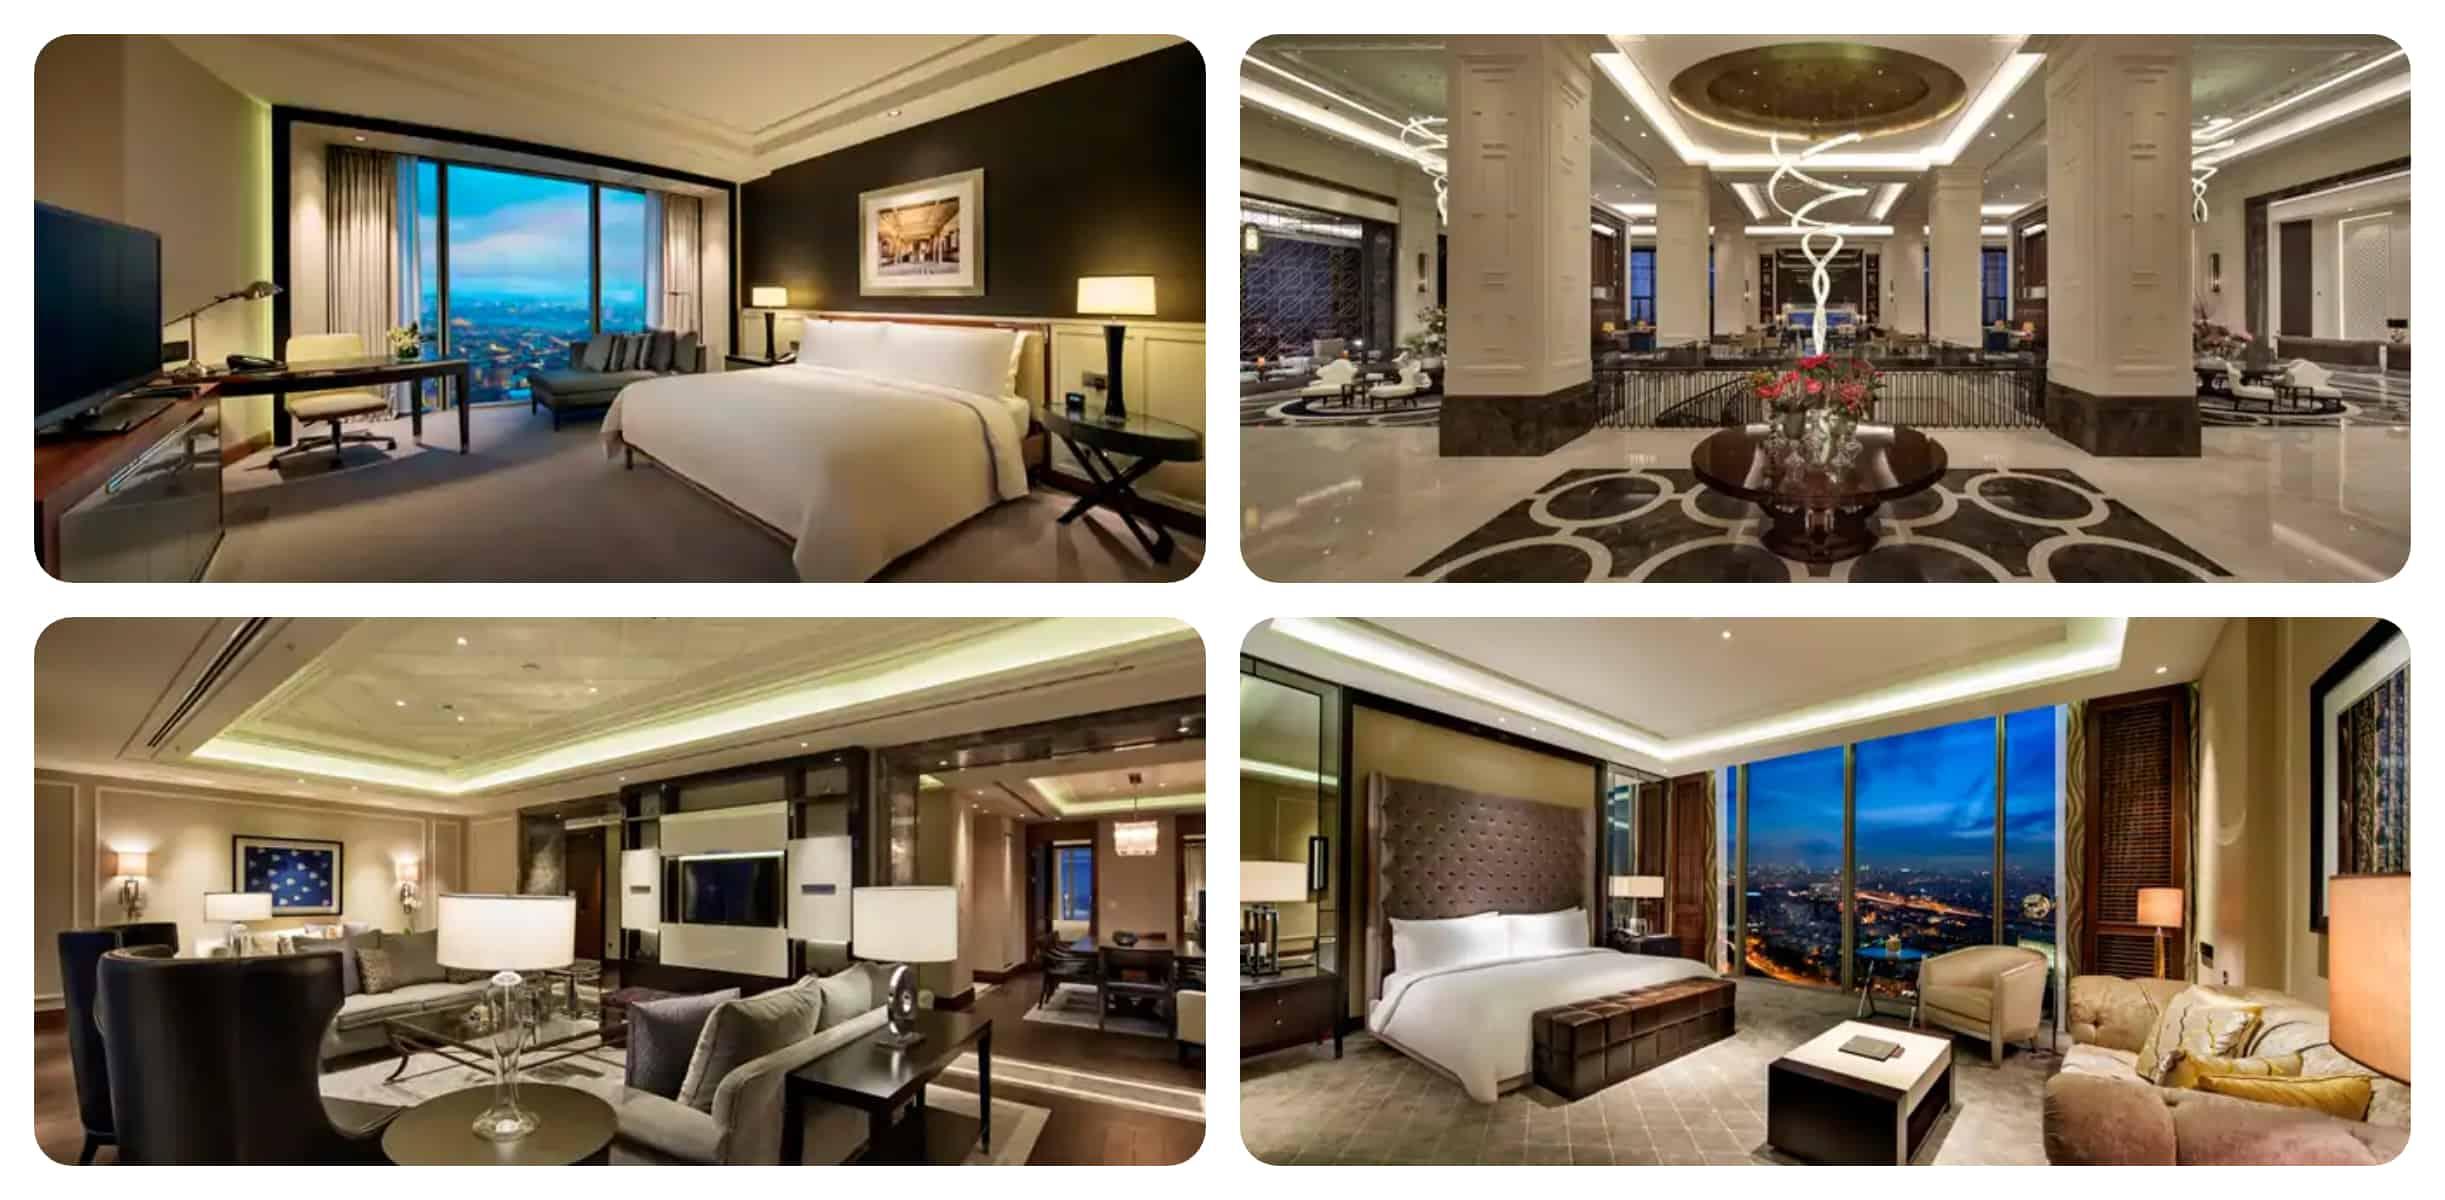 Hilton Marmara